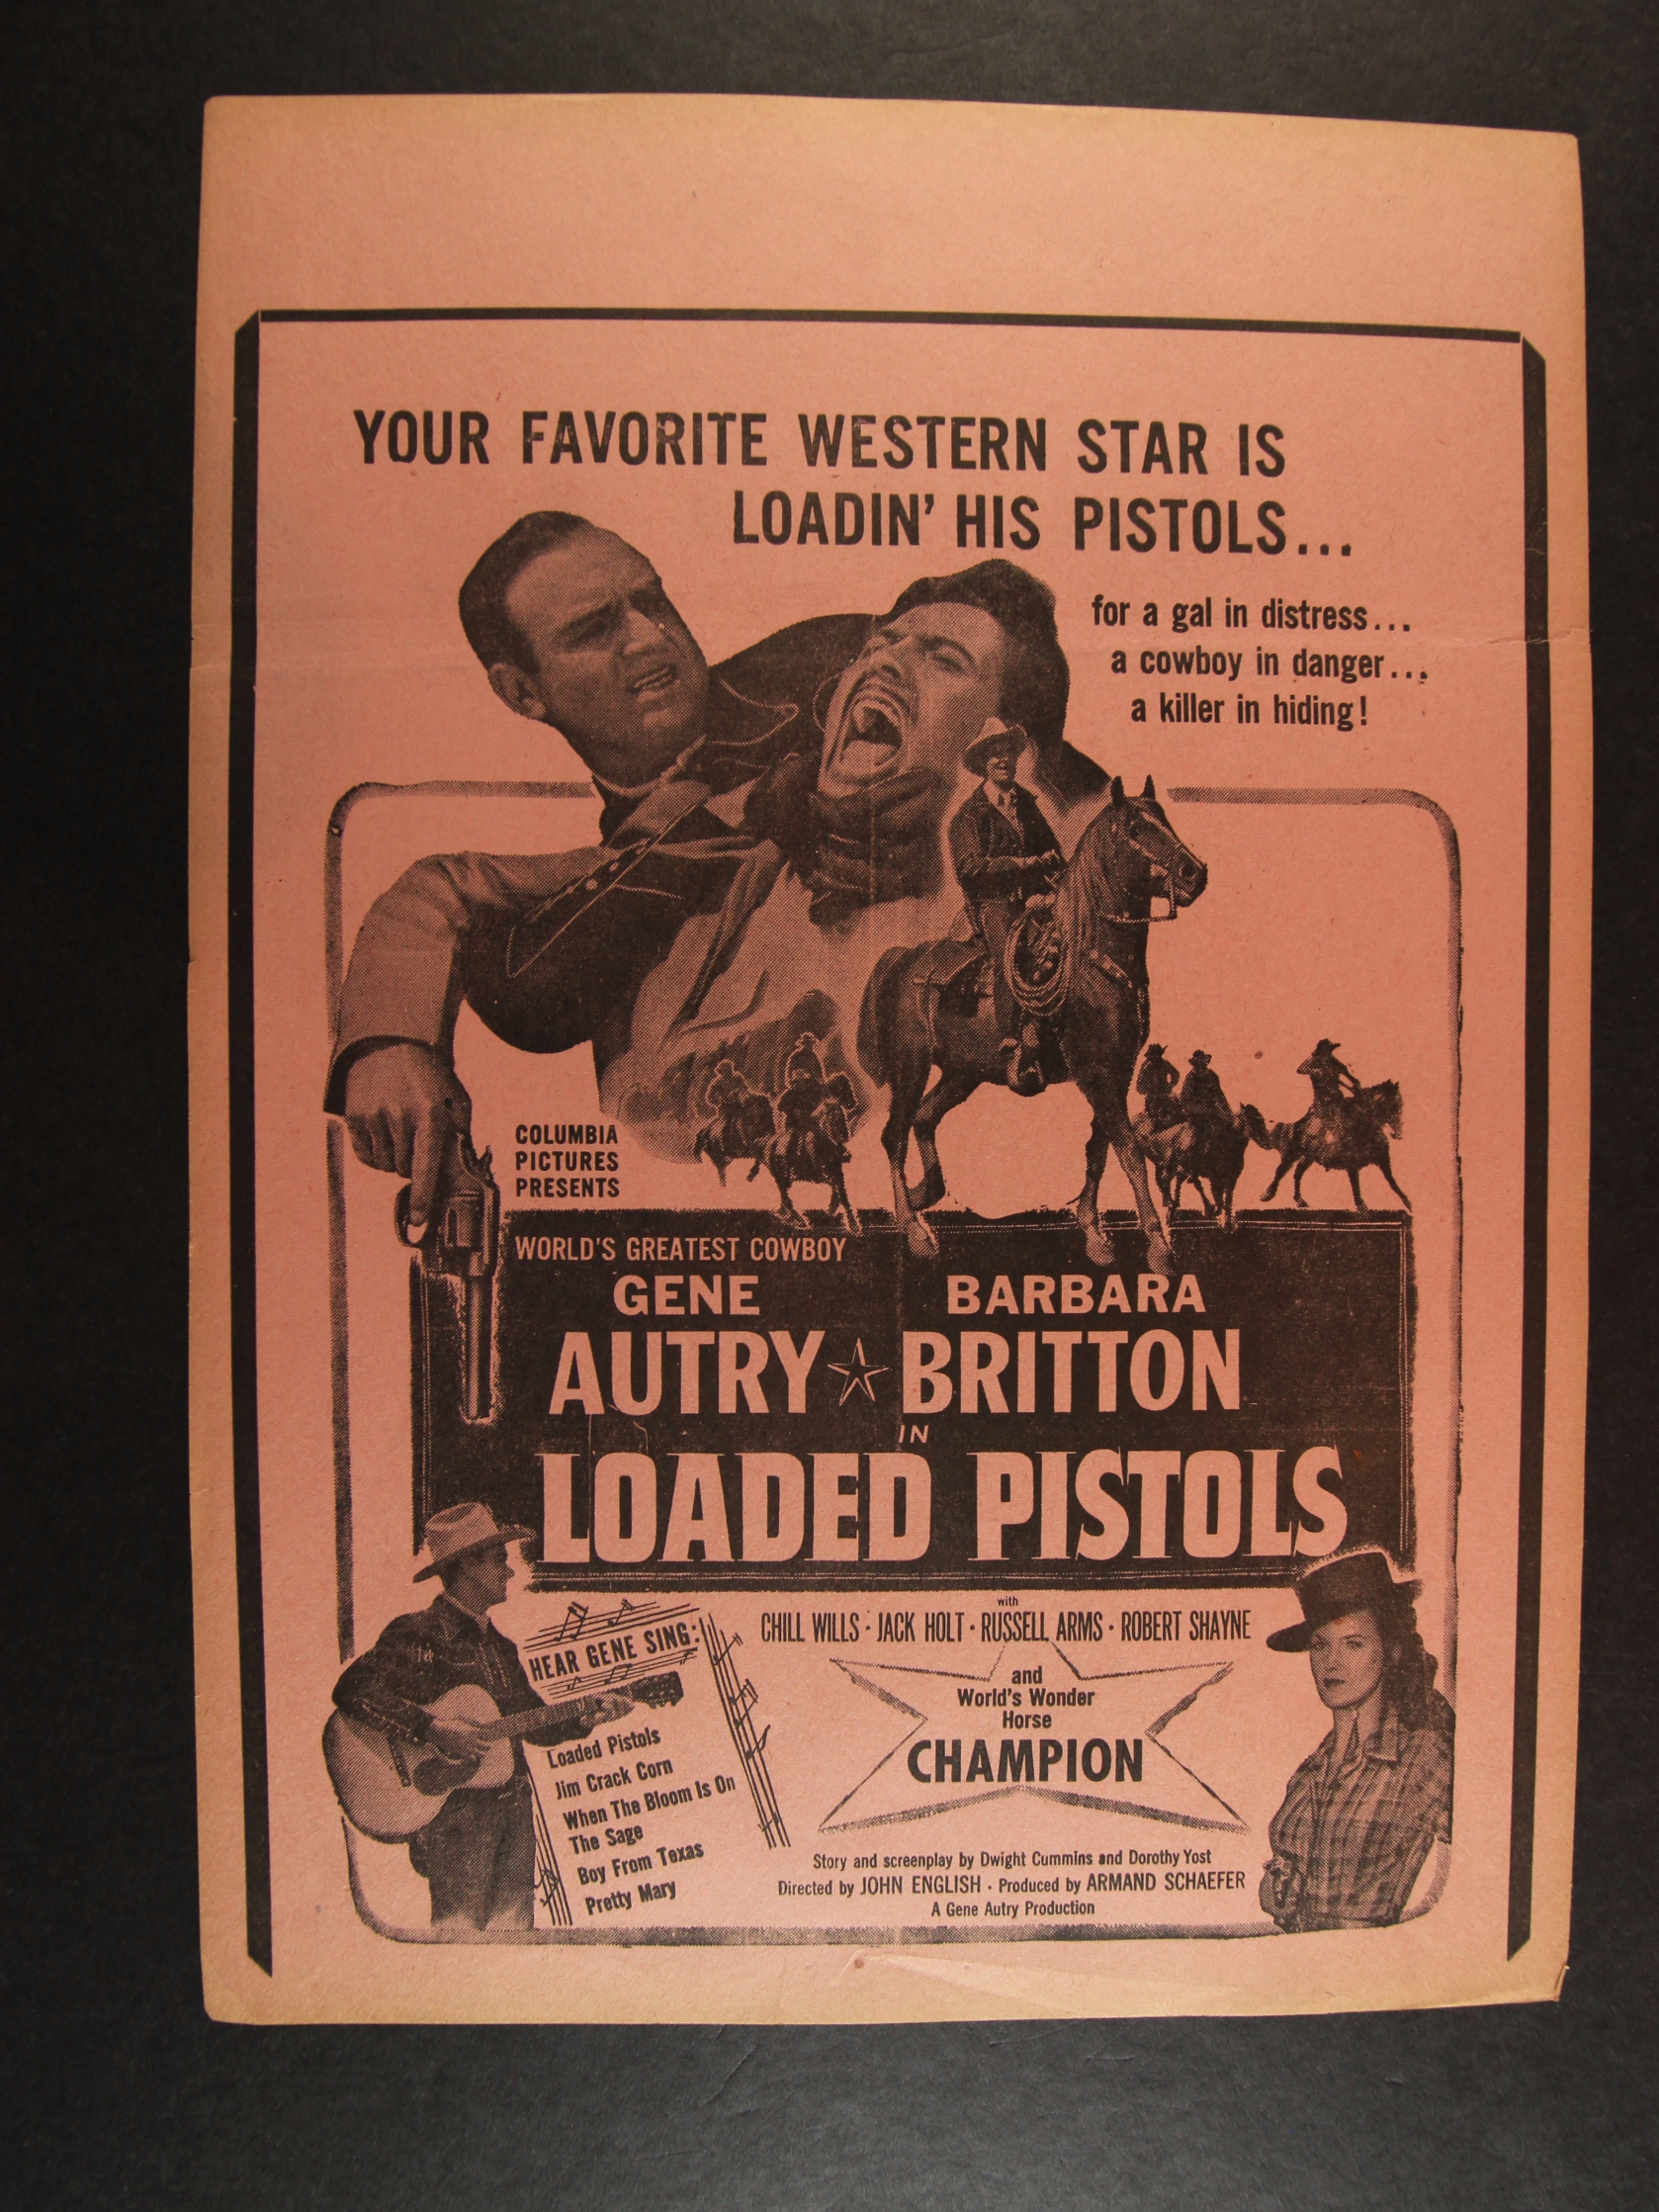 Gene Autry, Barbara Britton, Robert Shayne, and Champion in Loaded Pistols (1948)